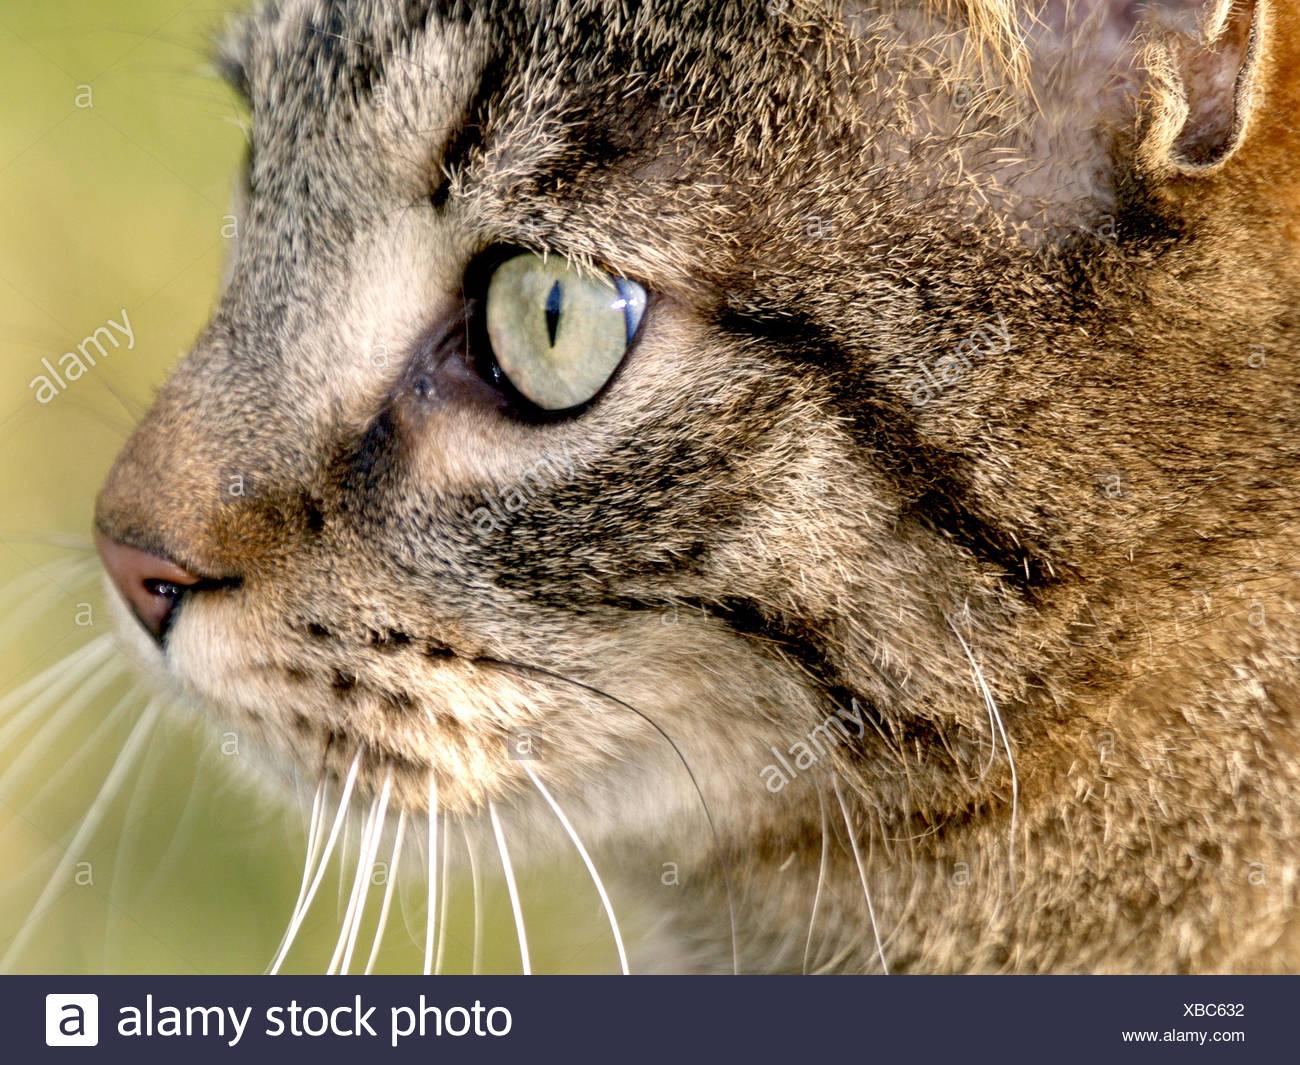 Tom Cat Stock Photo